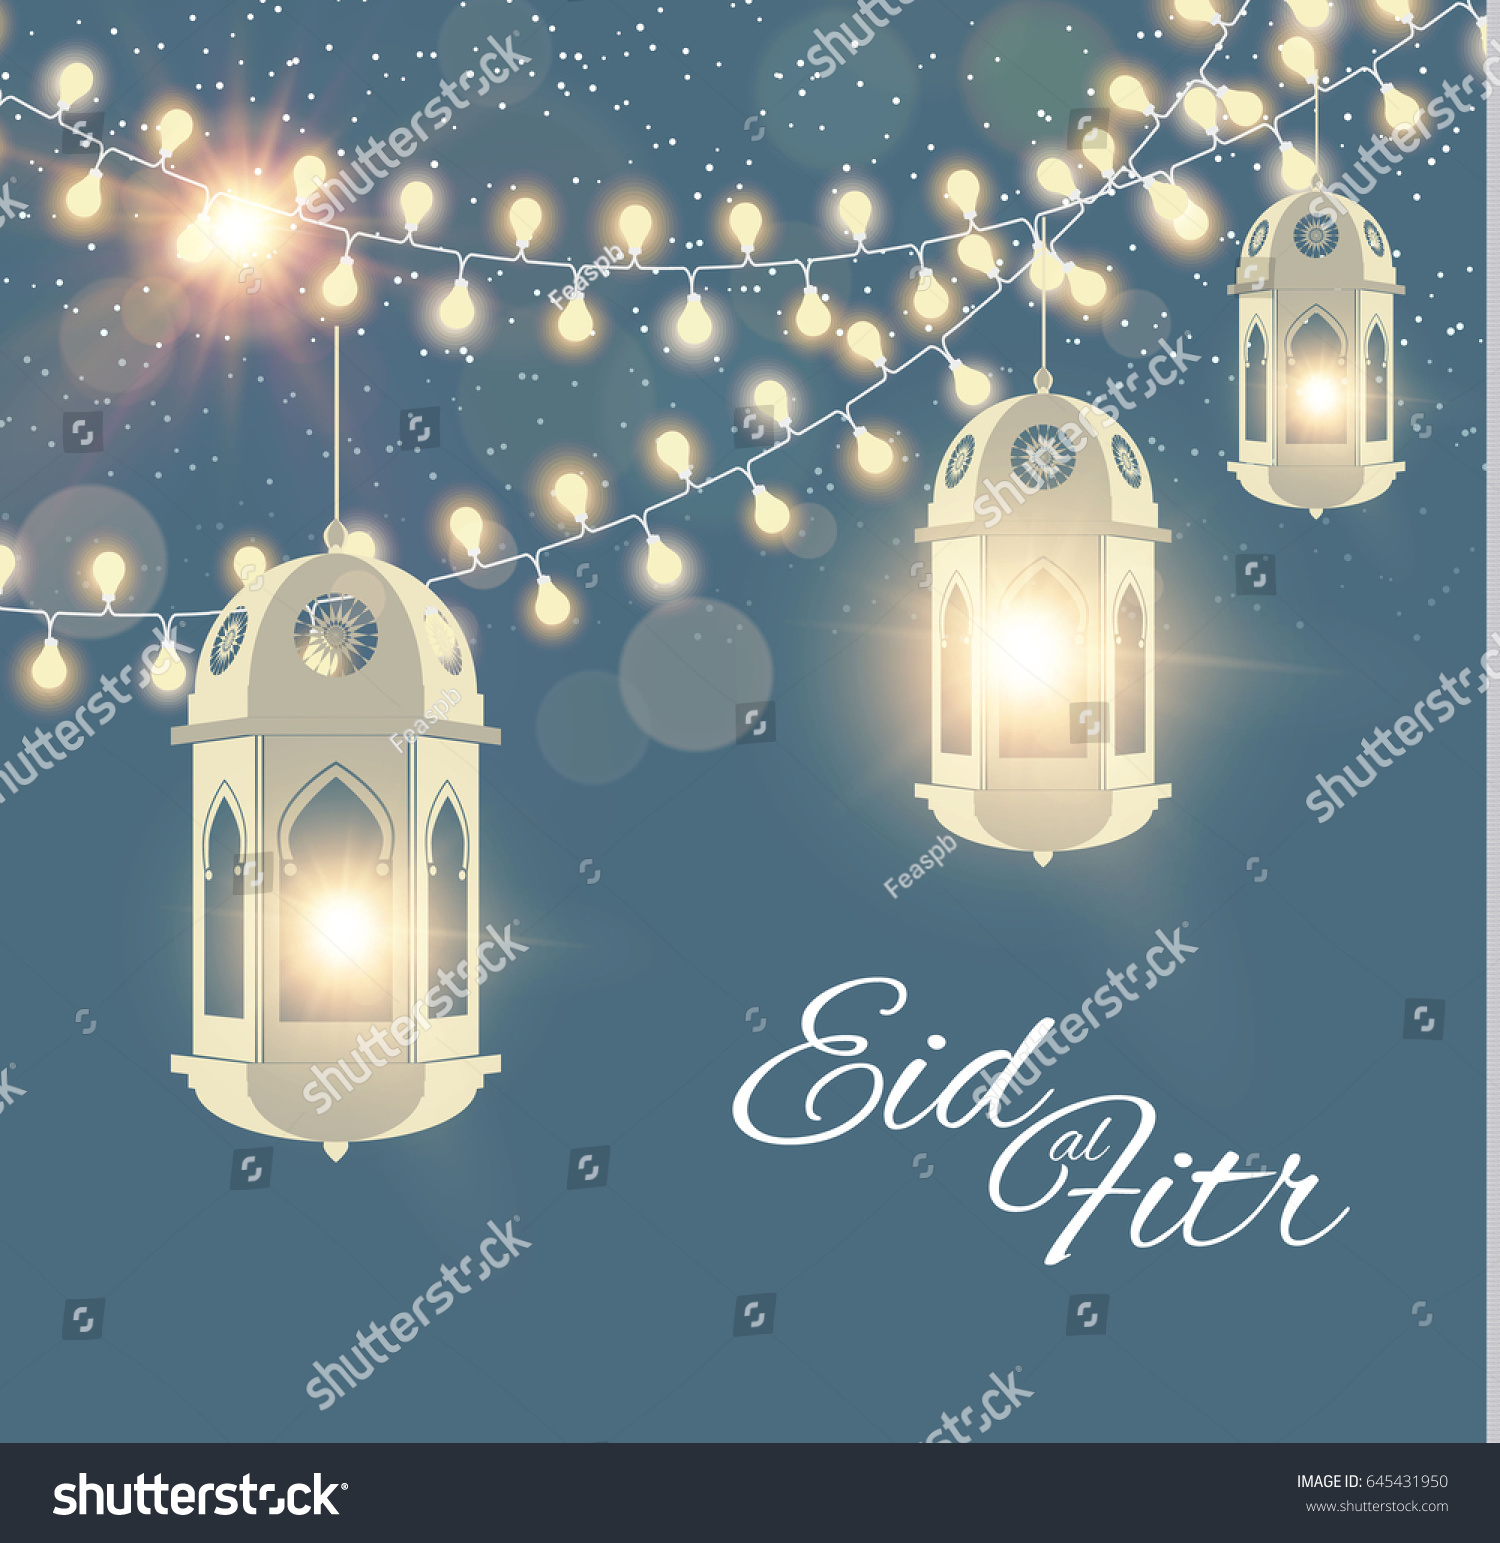 Most Inspiring Eid Mubarak Eid Al-Fitr Feast - stock-vector-eid-al-fitr-islamic-holiday-muslim-feast-eid-mubarak-ramadan-kareem-eid-said-shining-lanterns-645431950  HD_364298 .jpg